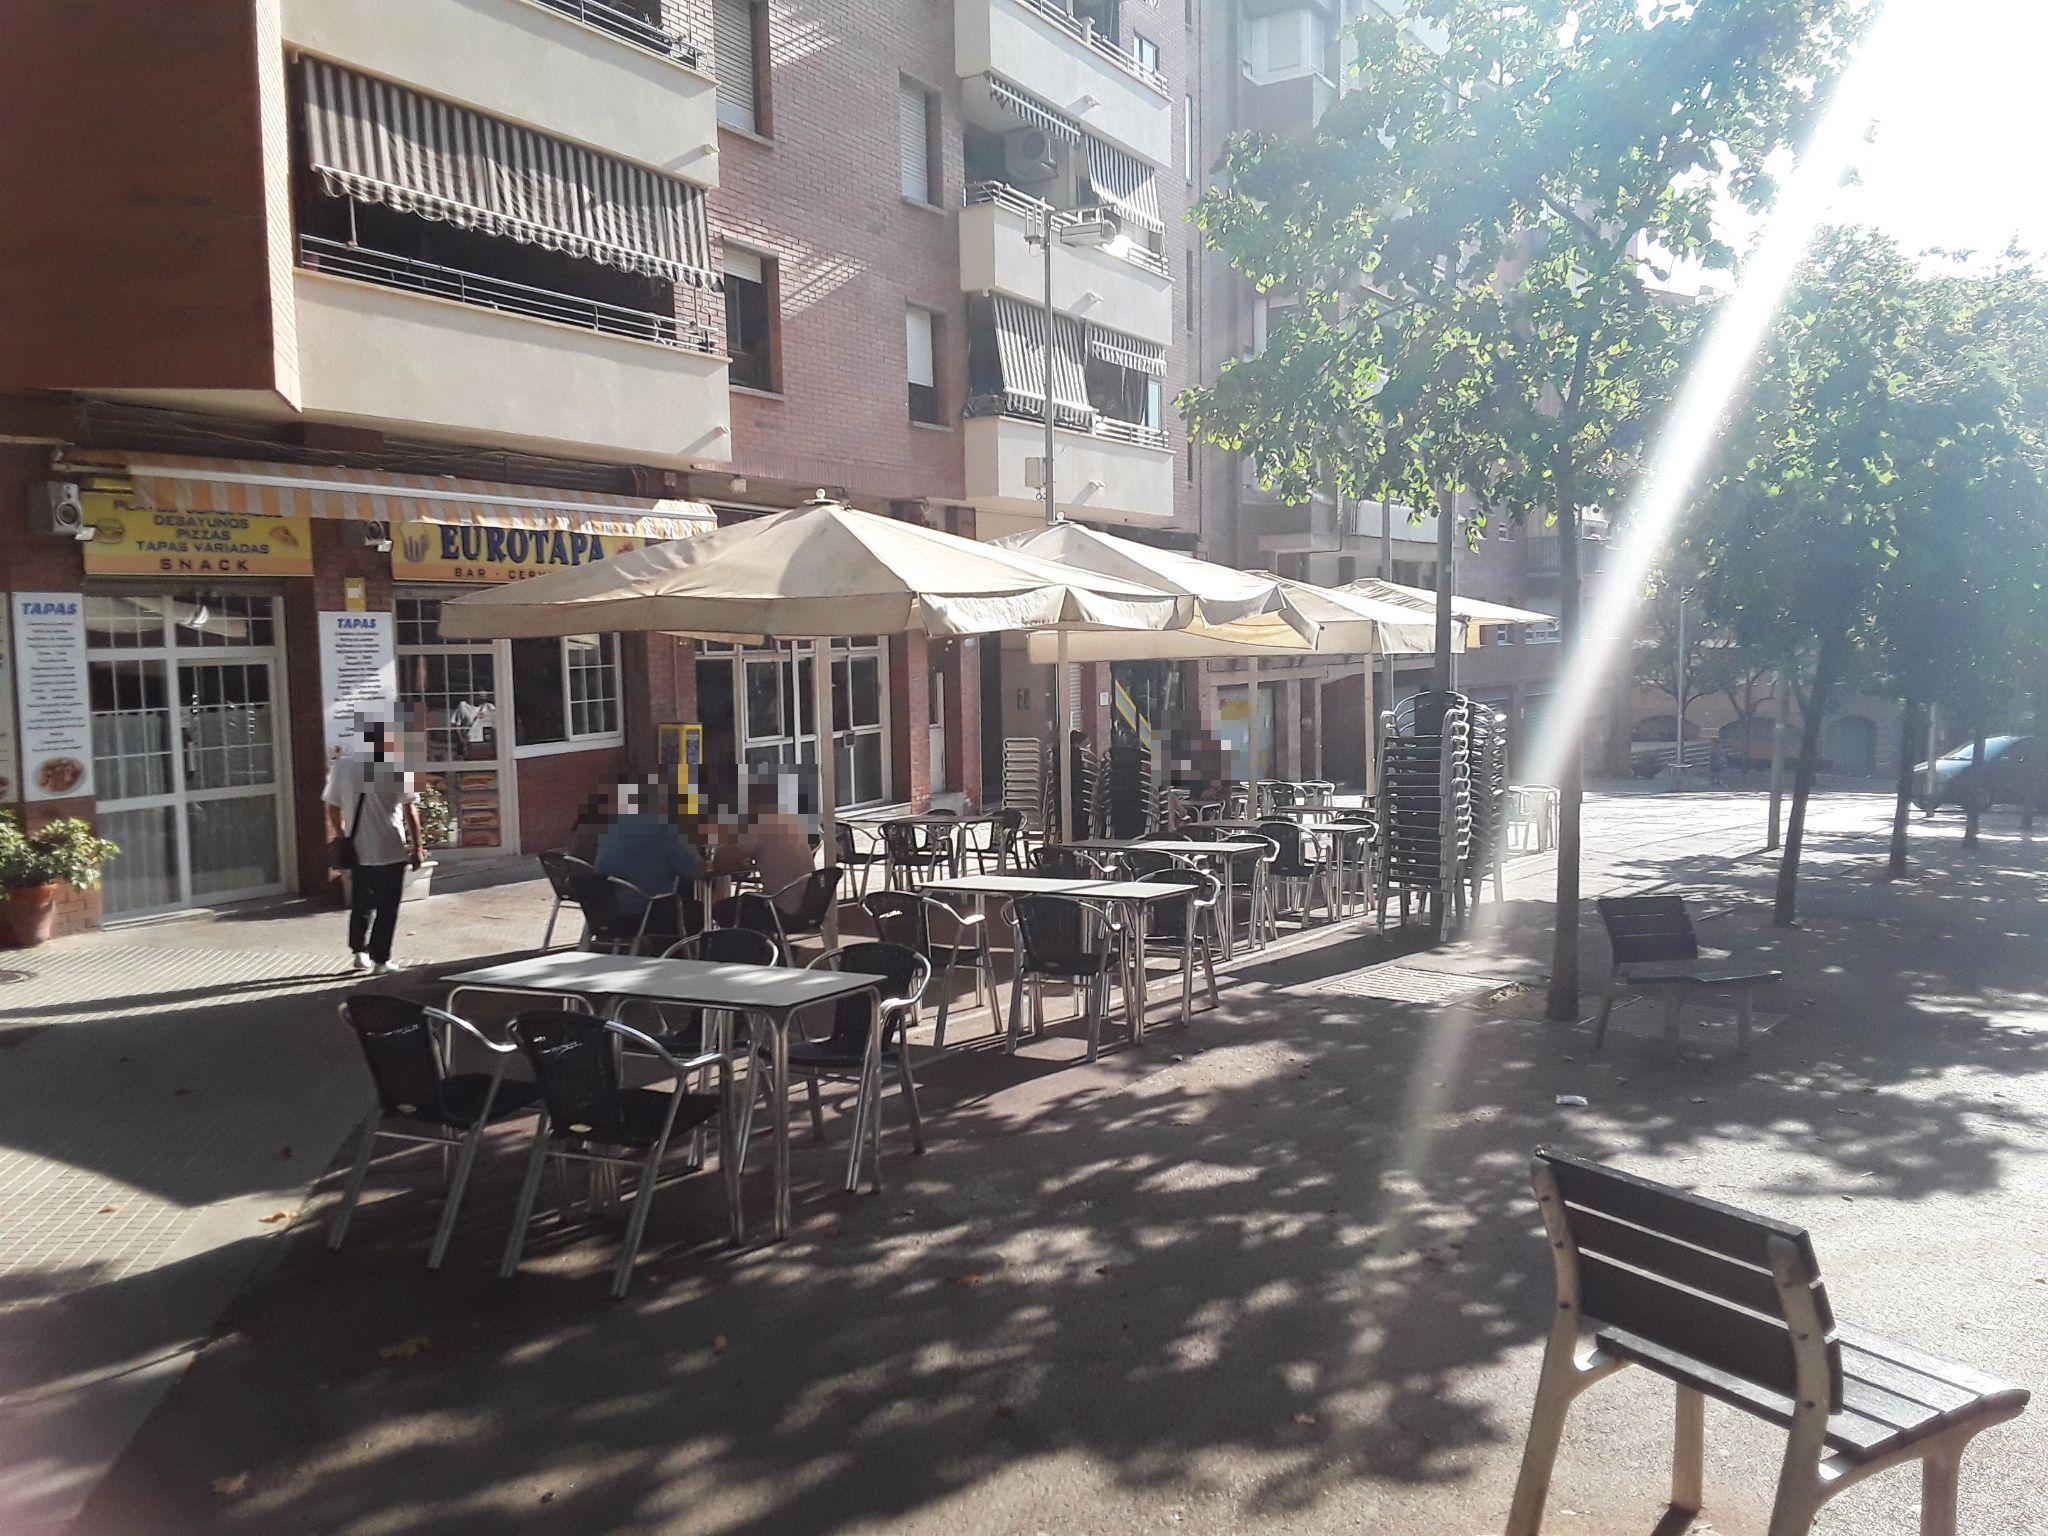 bar-bien-situado-en-alquiler-en-viladecans-barcelona-4